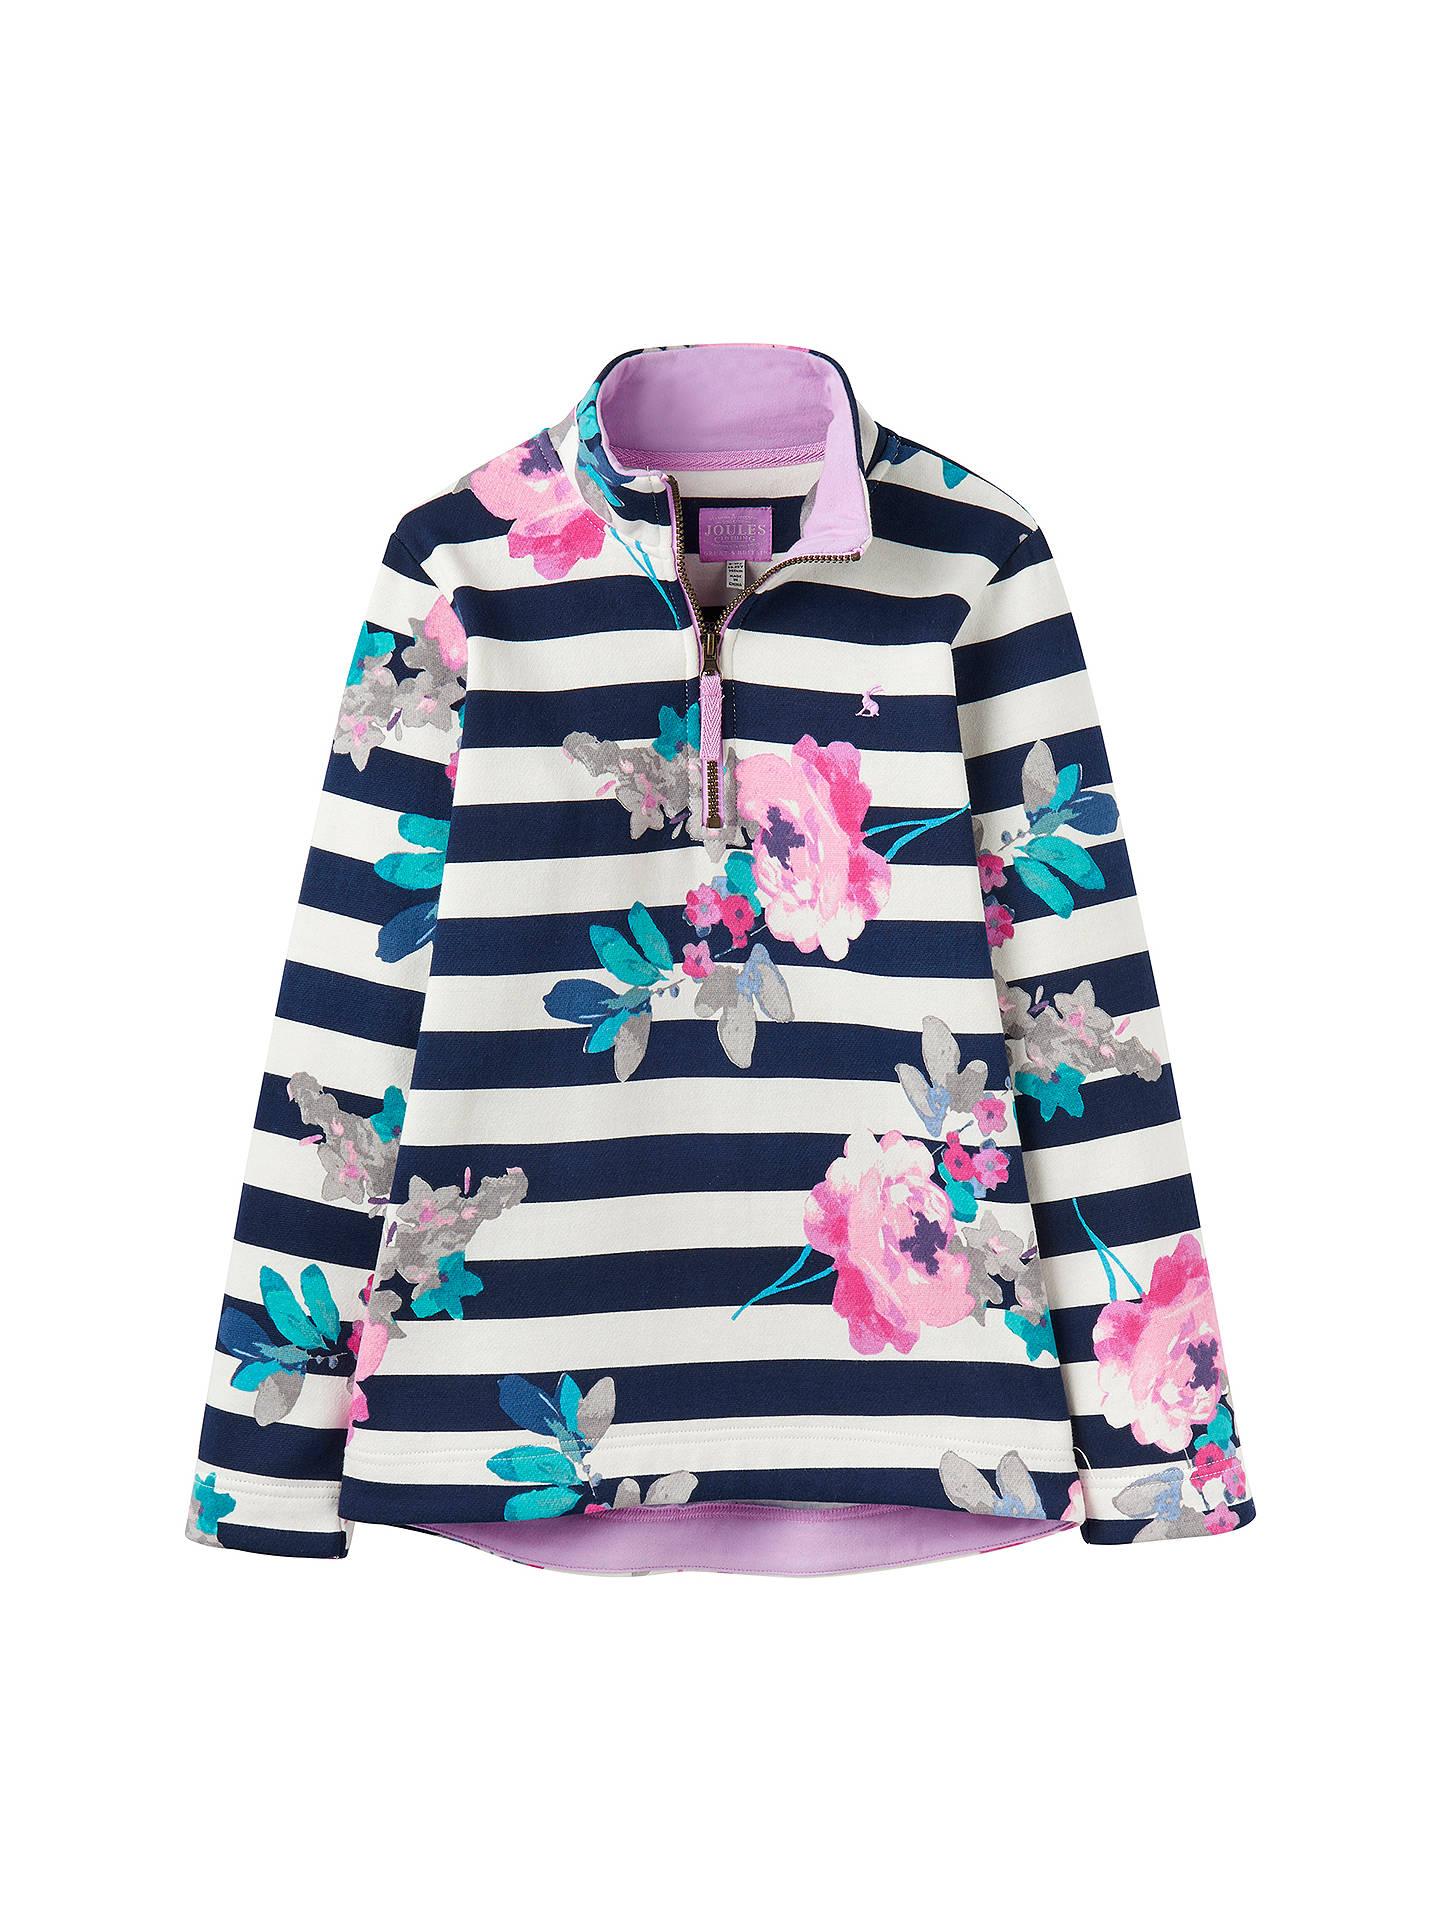 91c8f0a0d Little Joule Girls  Fairdale Floral Sweatshirt